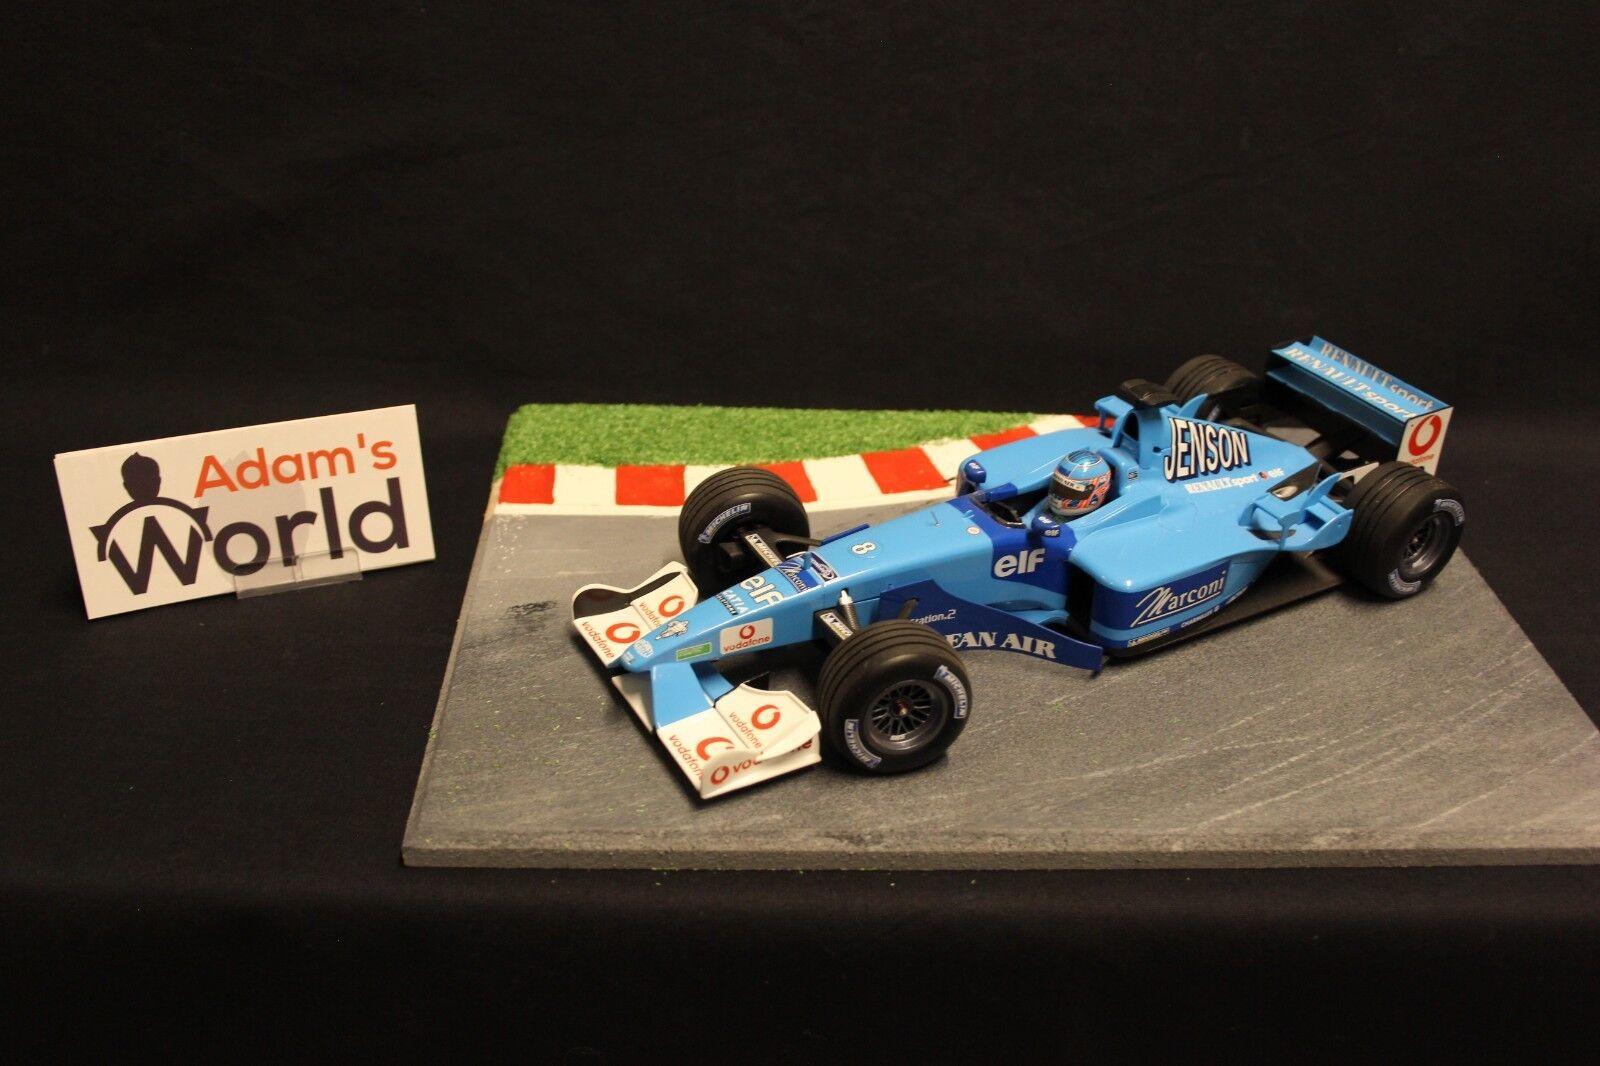 Minichamps Benetton Renault Sport B201 2001 1 18 Jenson Button (GBR) (F1NB)